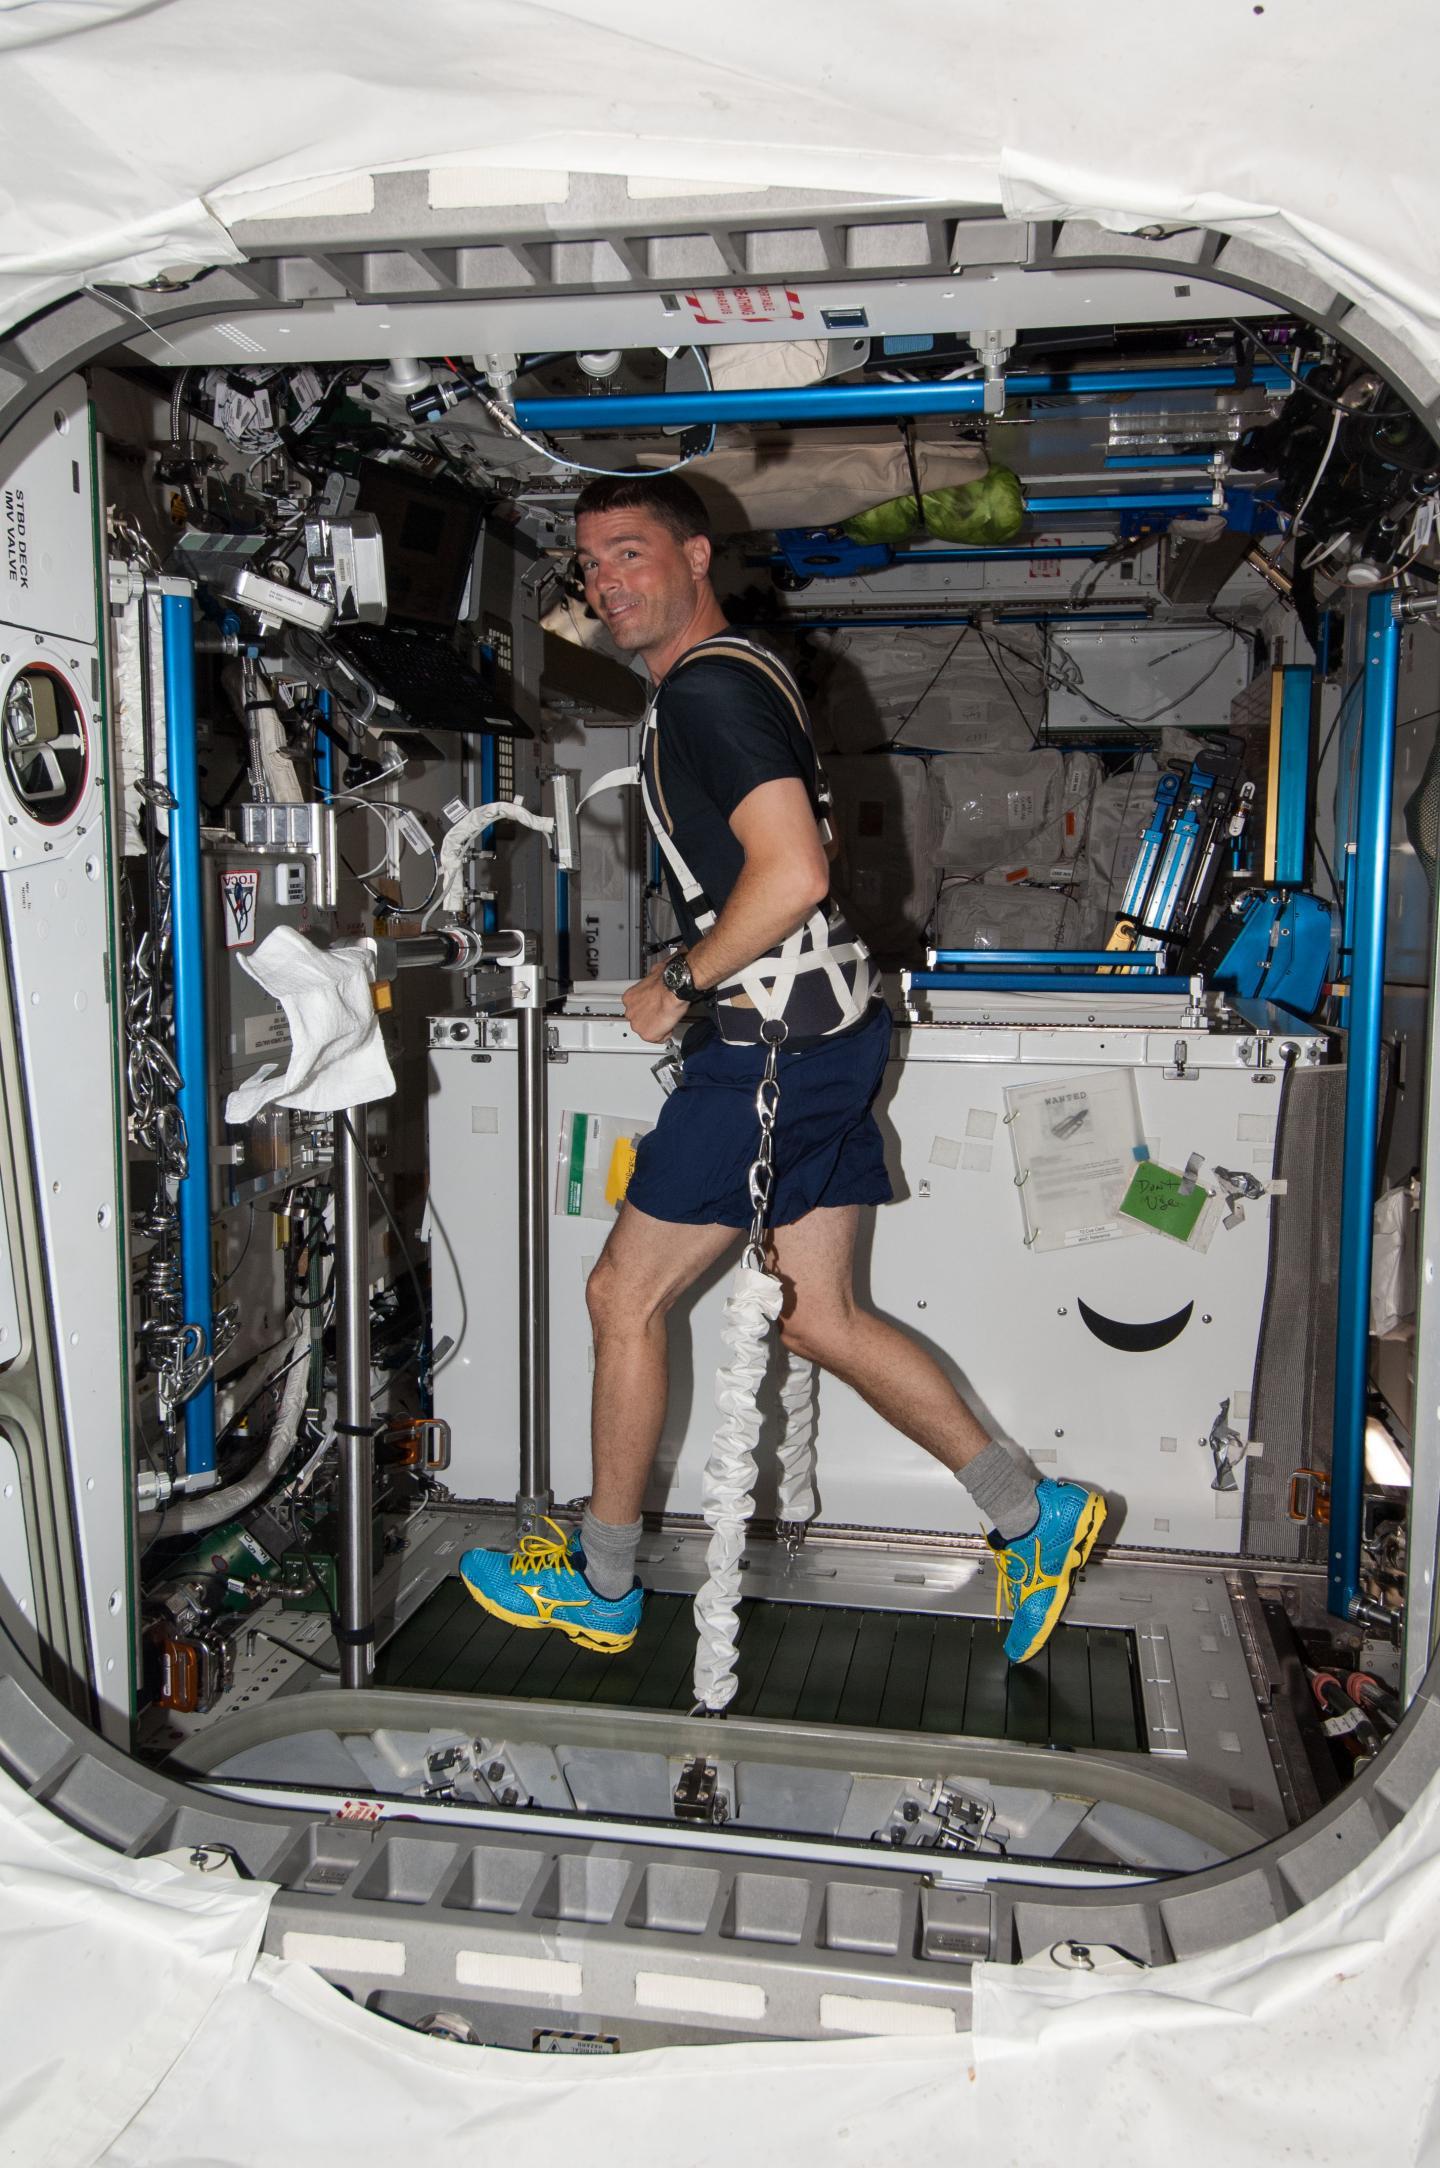 NASA Astronaut Exercises in Space